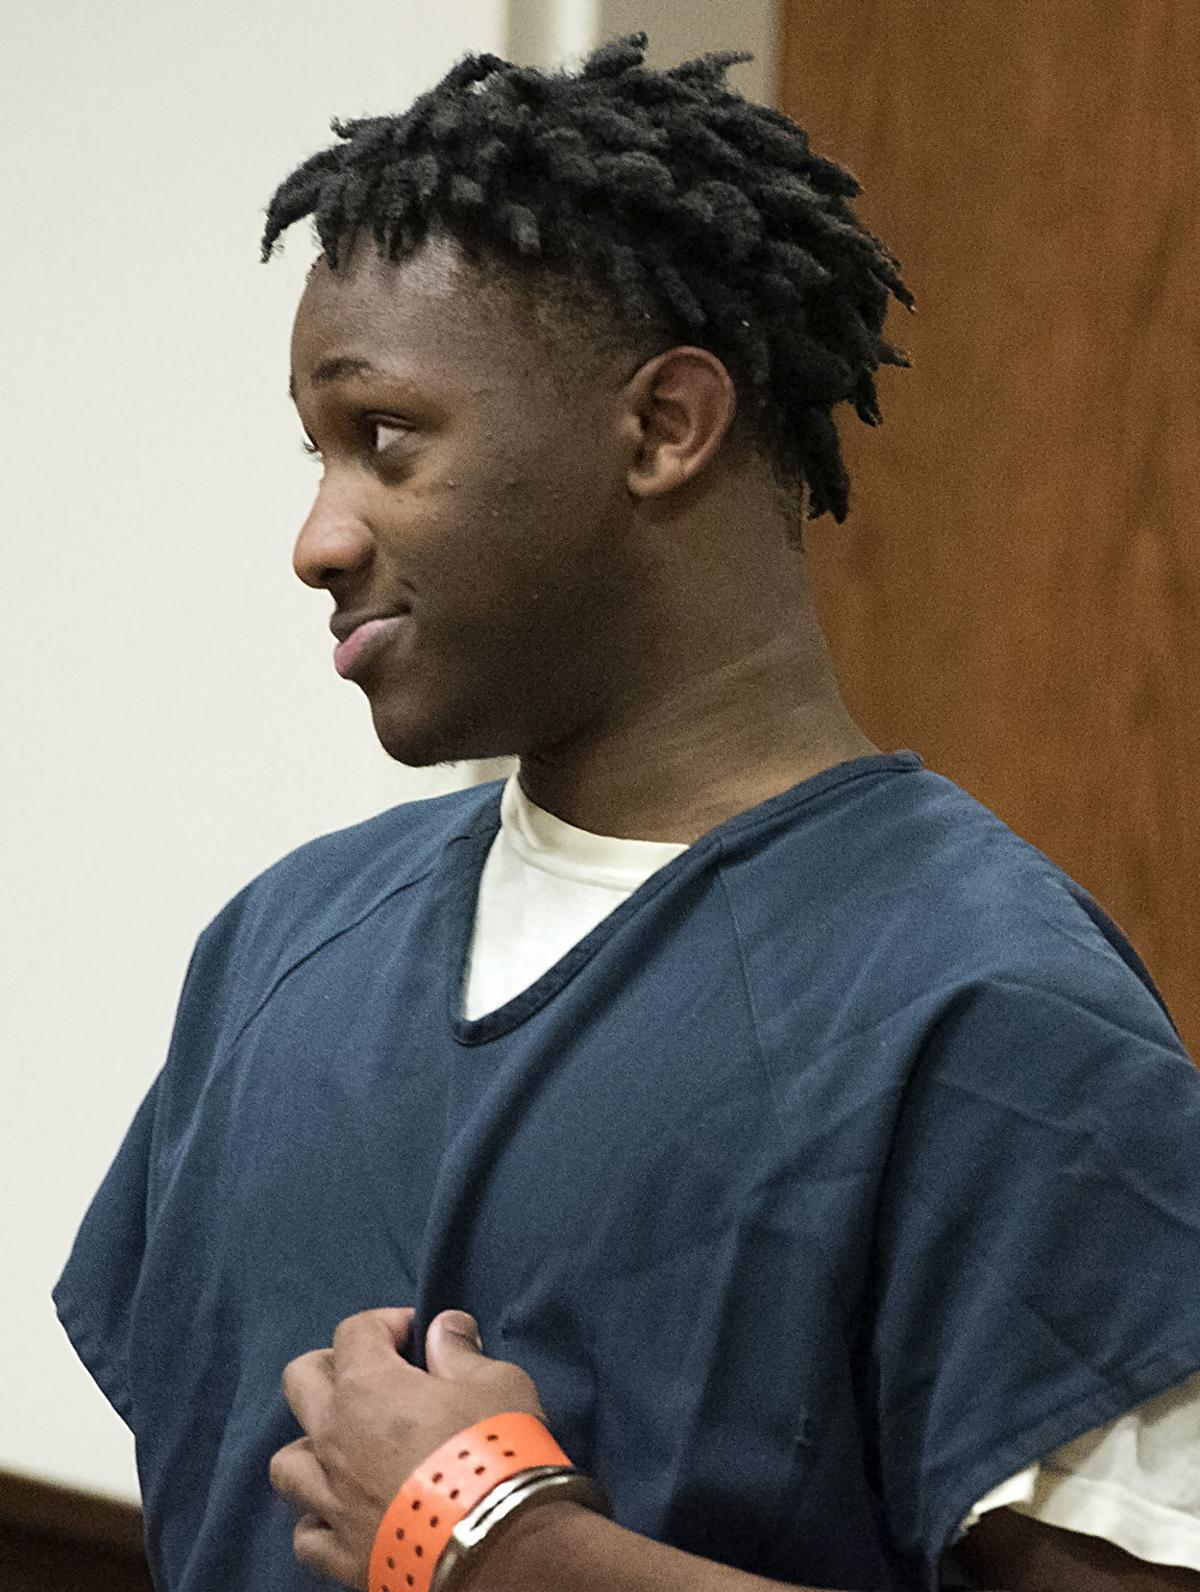 Natavian Morton sentencing